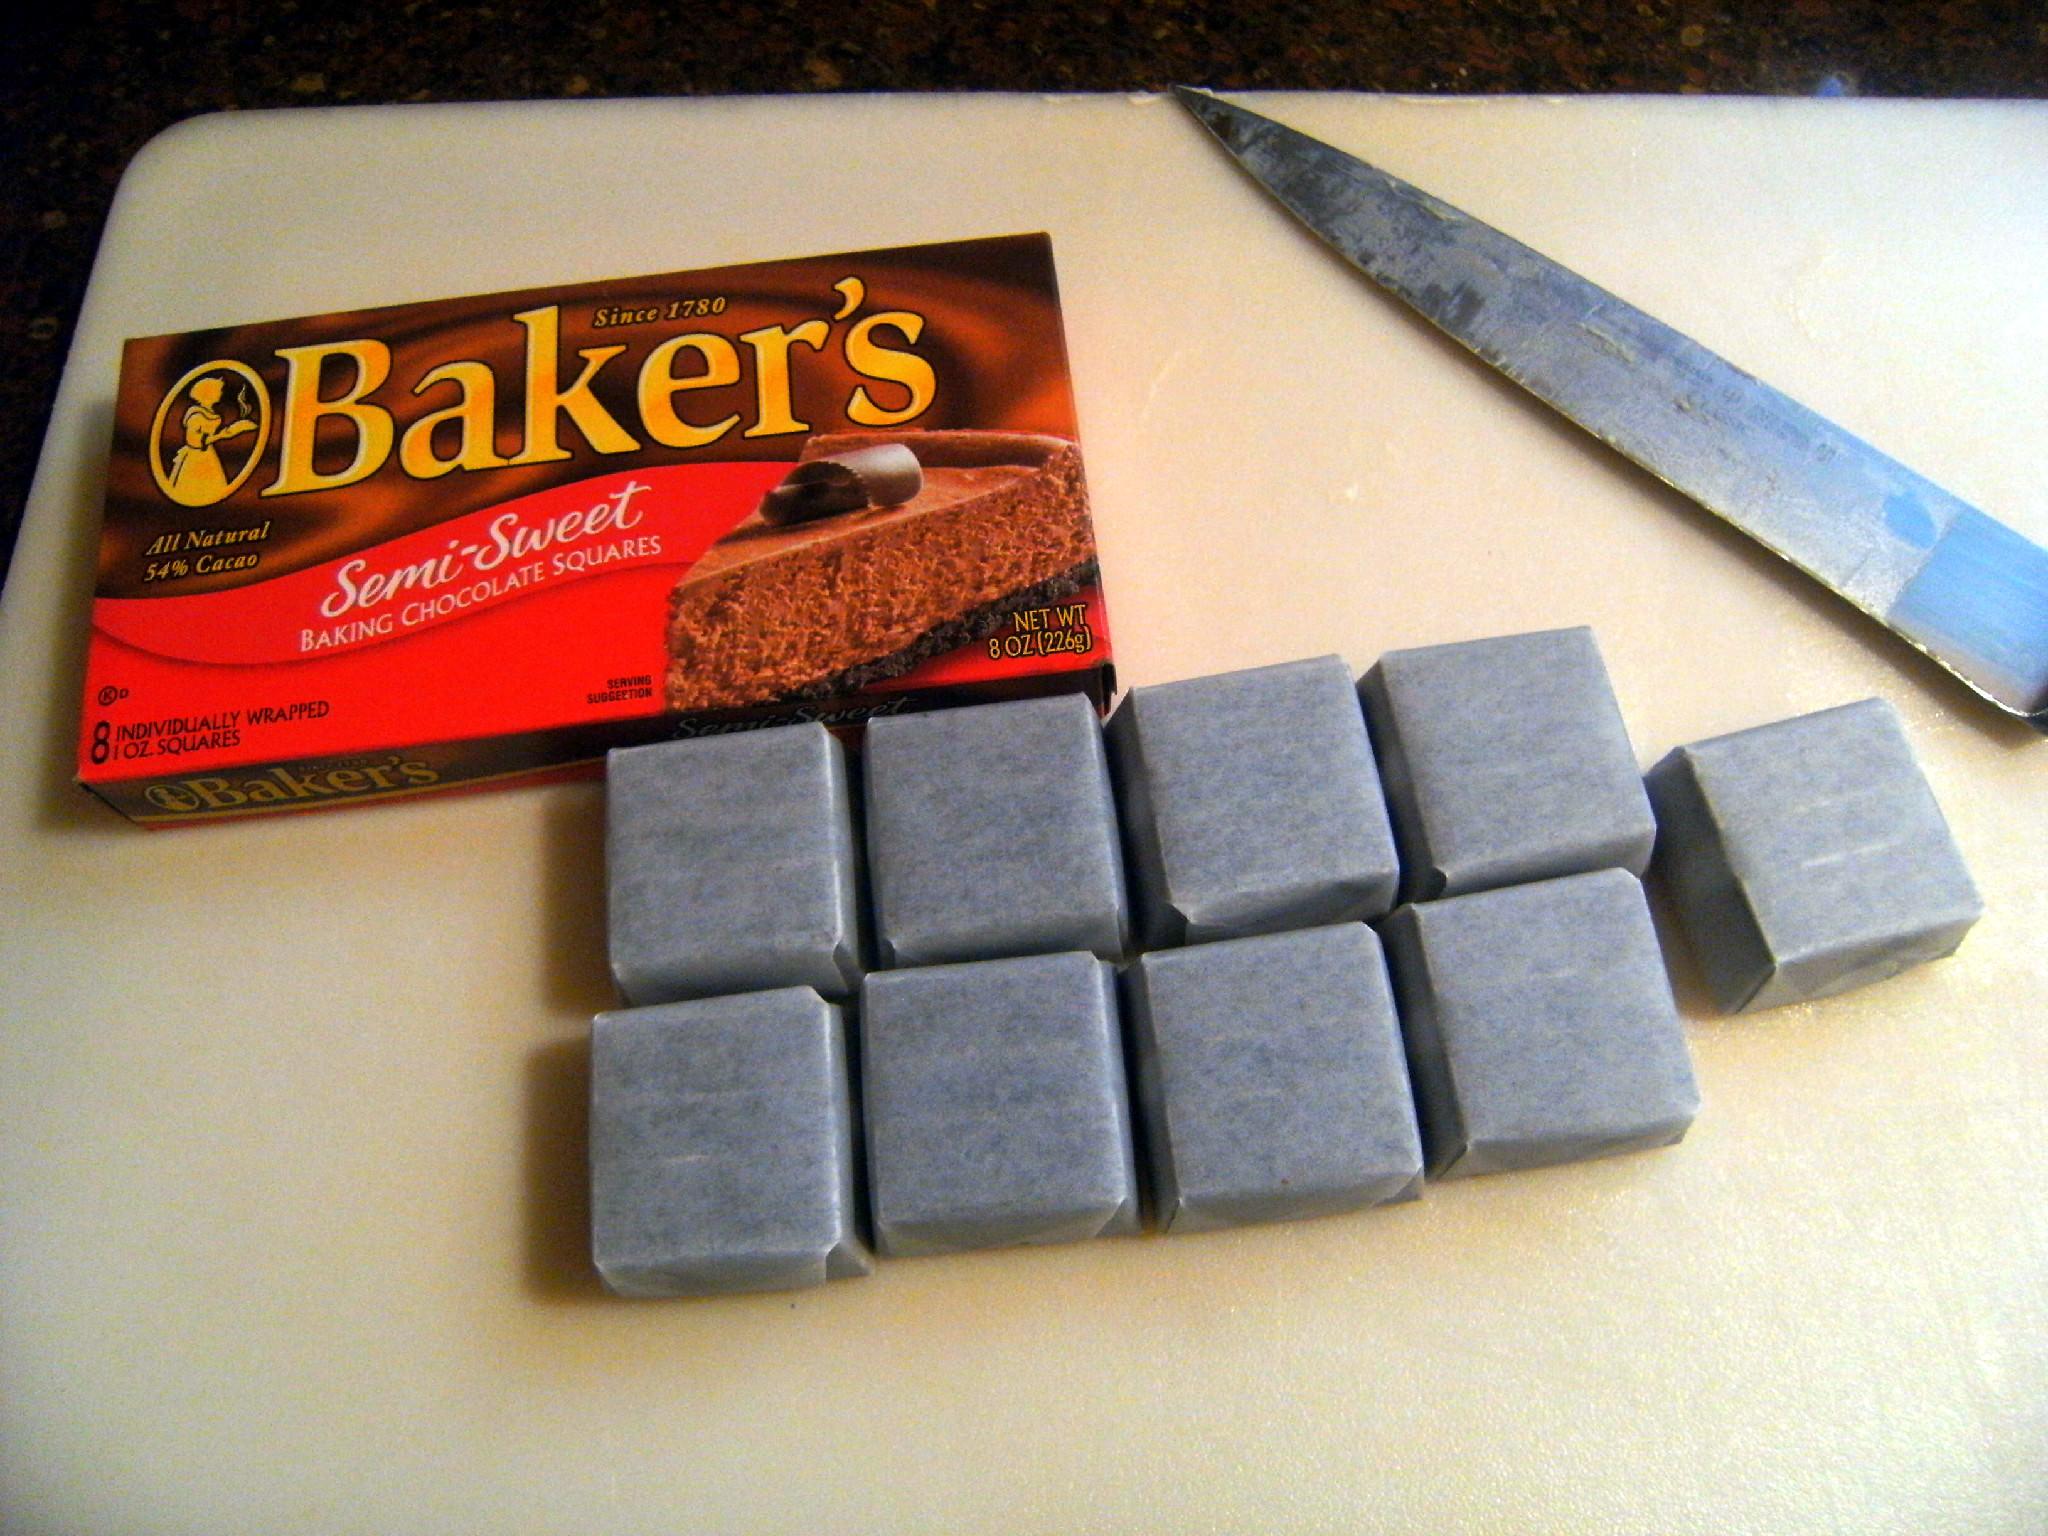 Baker's semi-sweet baking chocolate